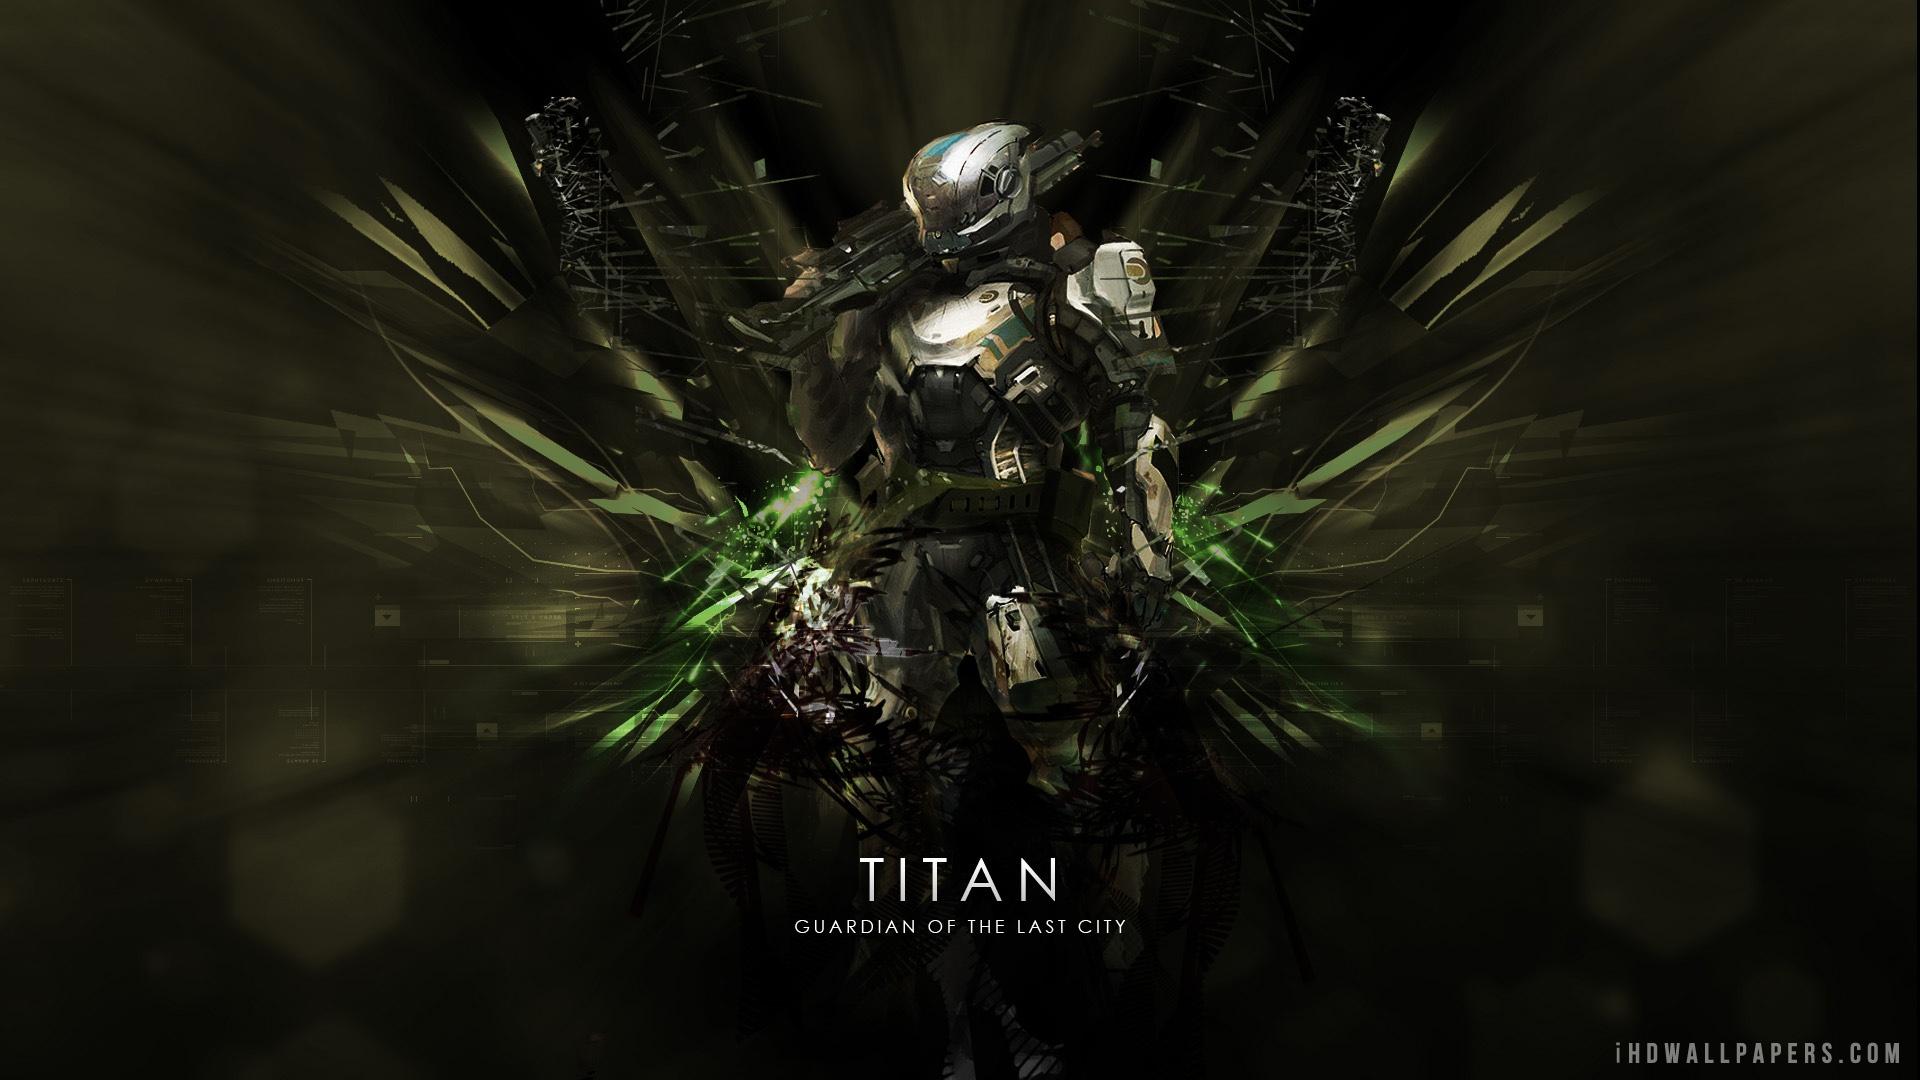 [44+] Destiny Titan Wallpapers on WallpaperSafari